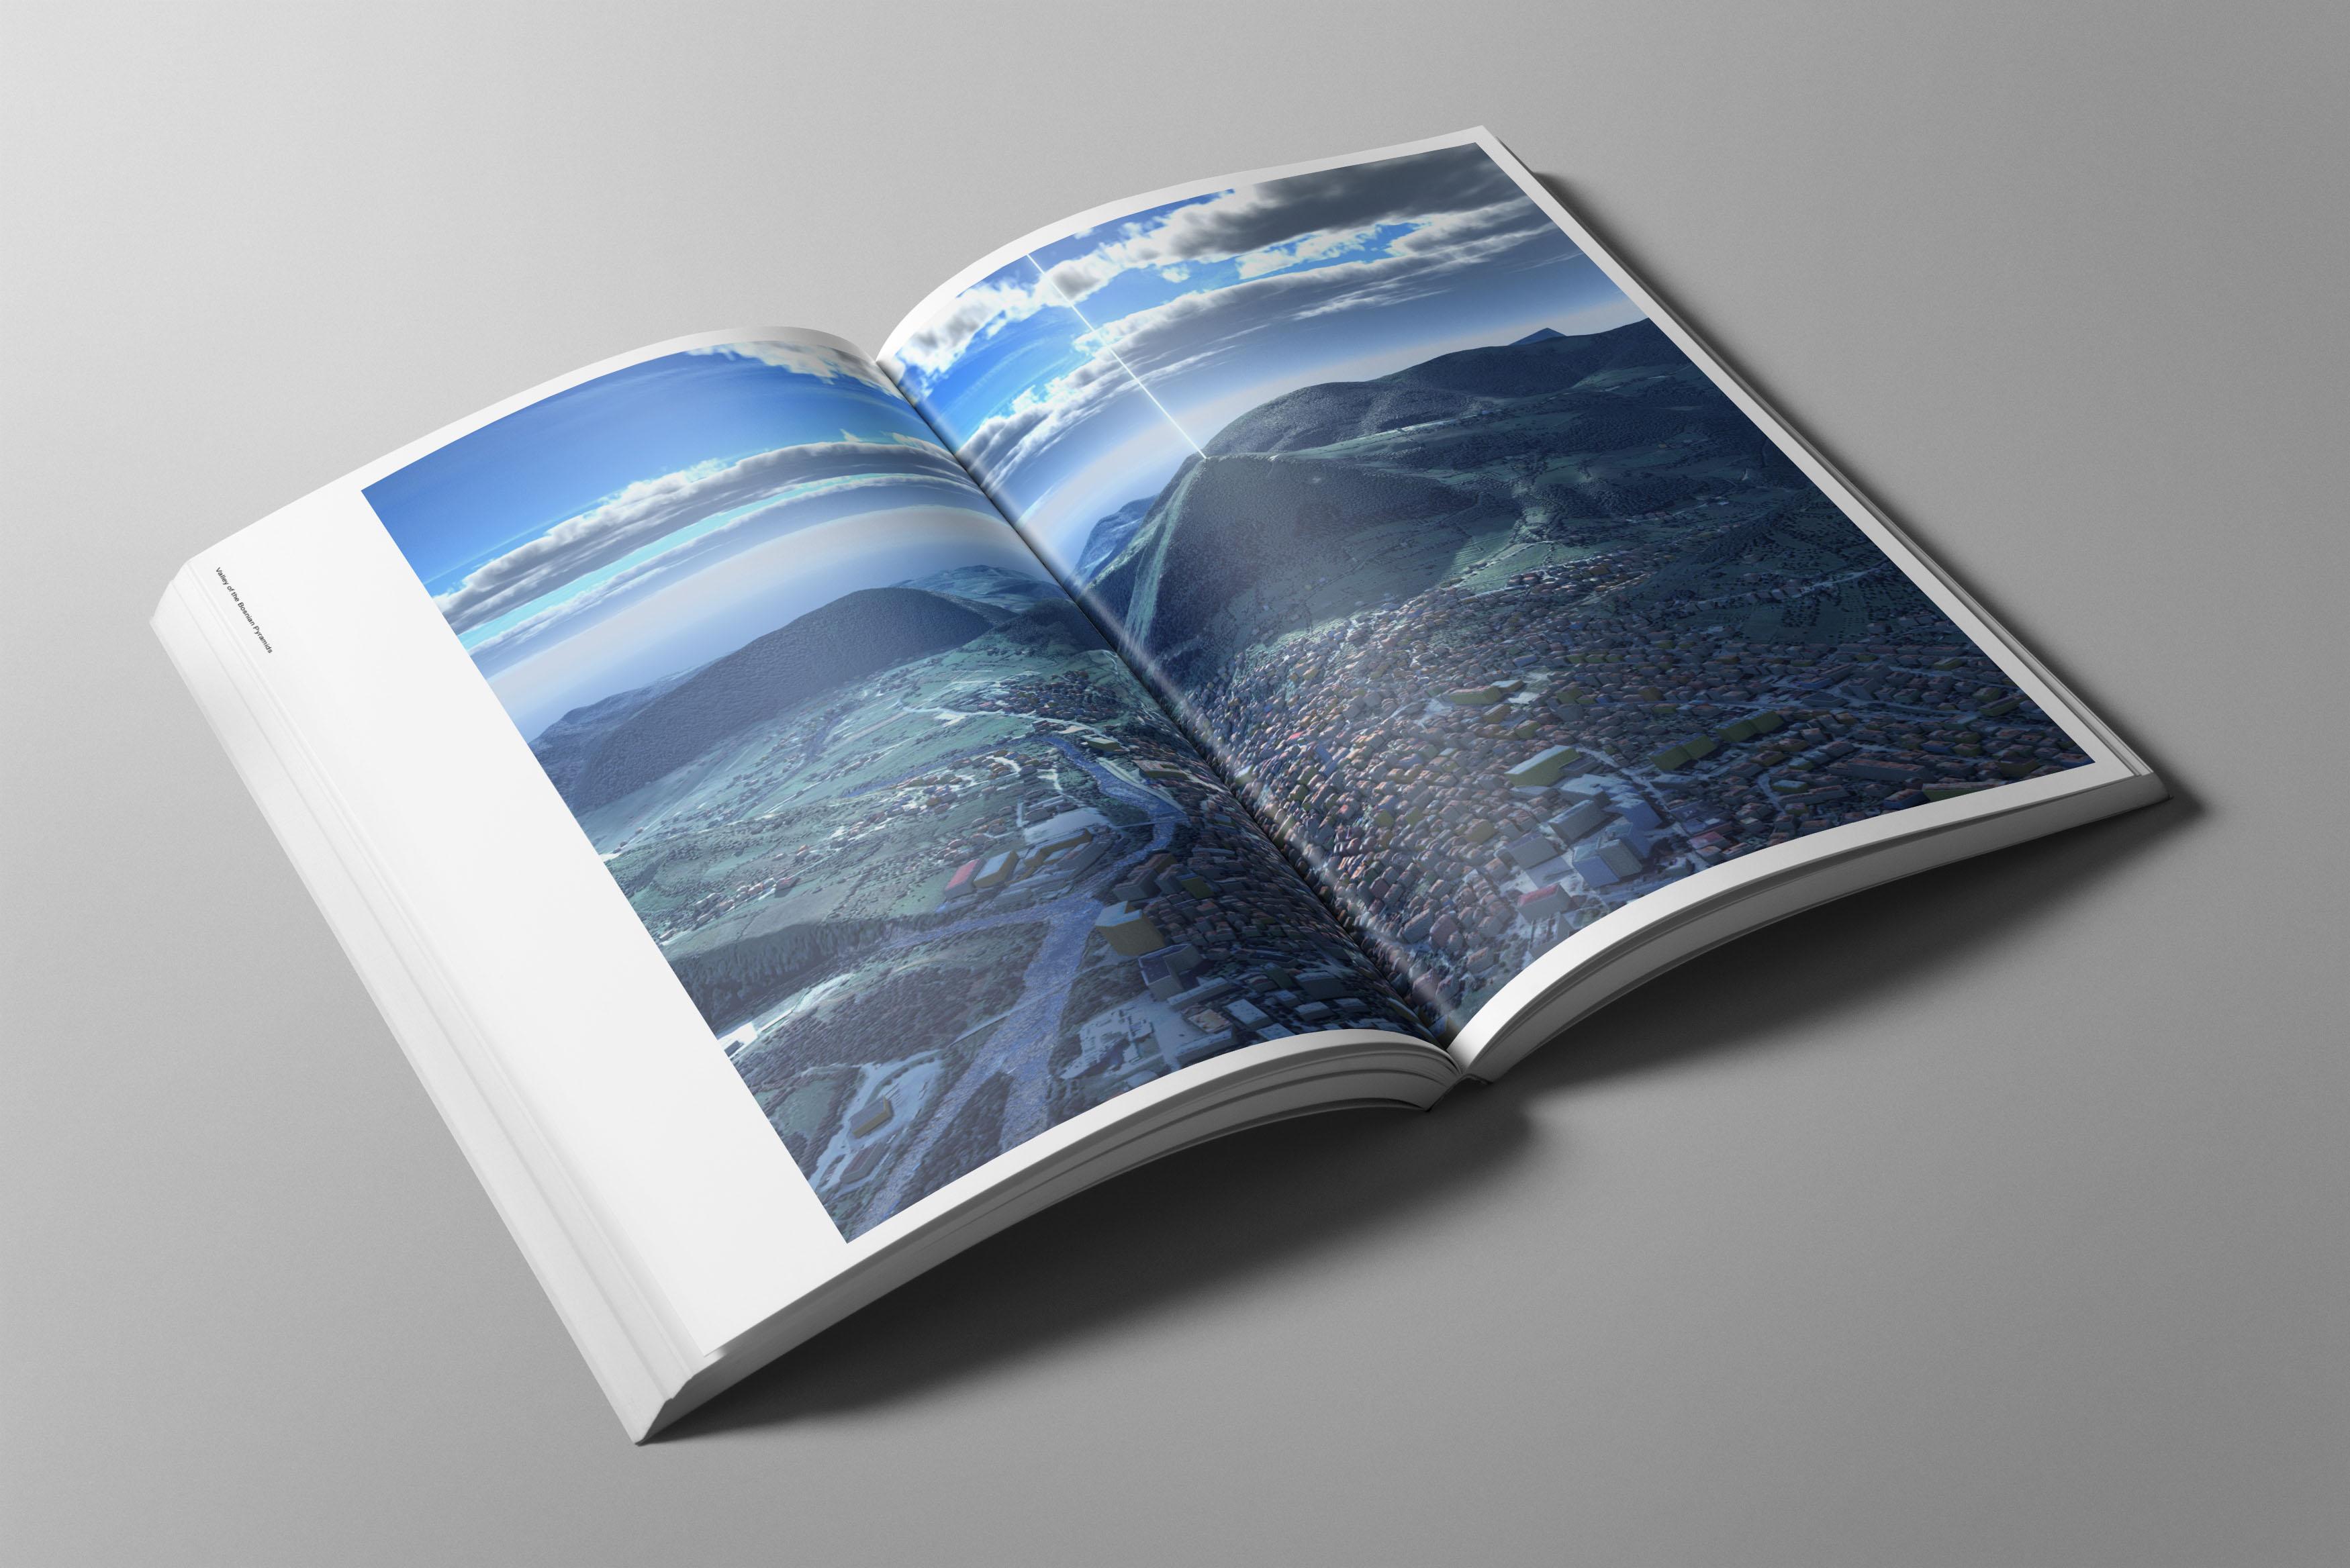 Moonsault! Livre audio | Gideon Caldwell | Audible.fr